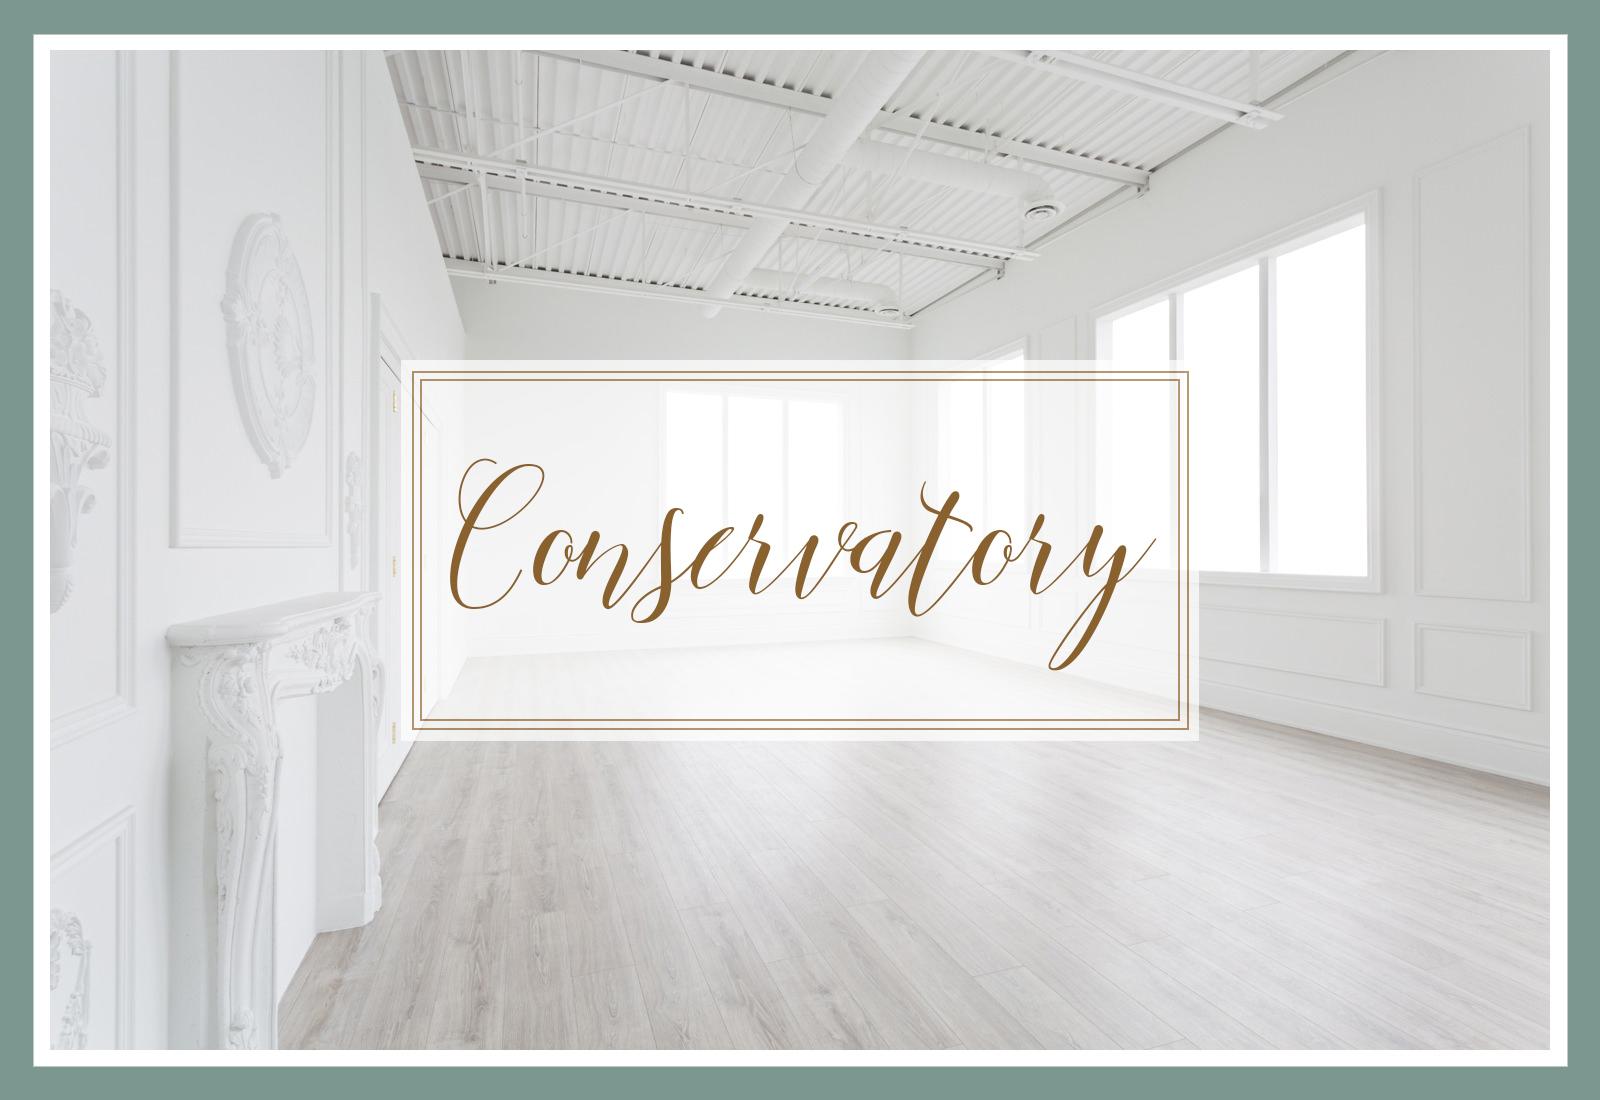 Conservatory Studio navigation